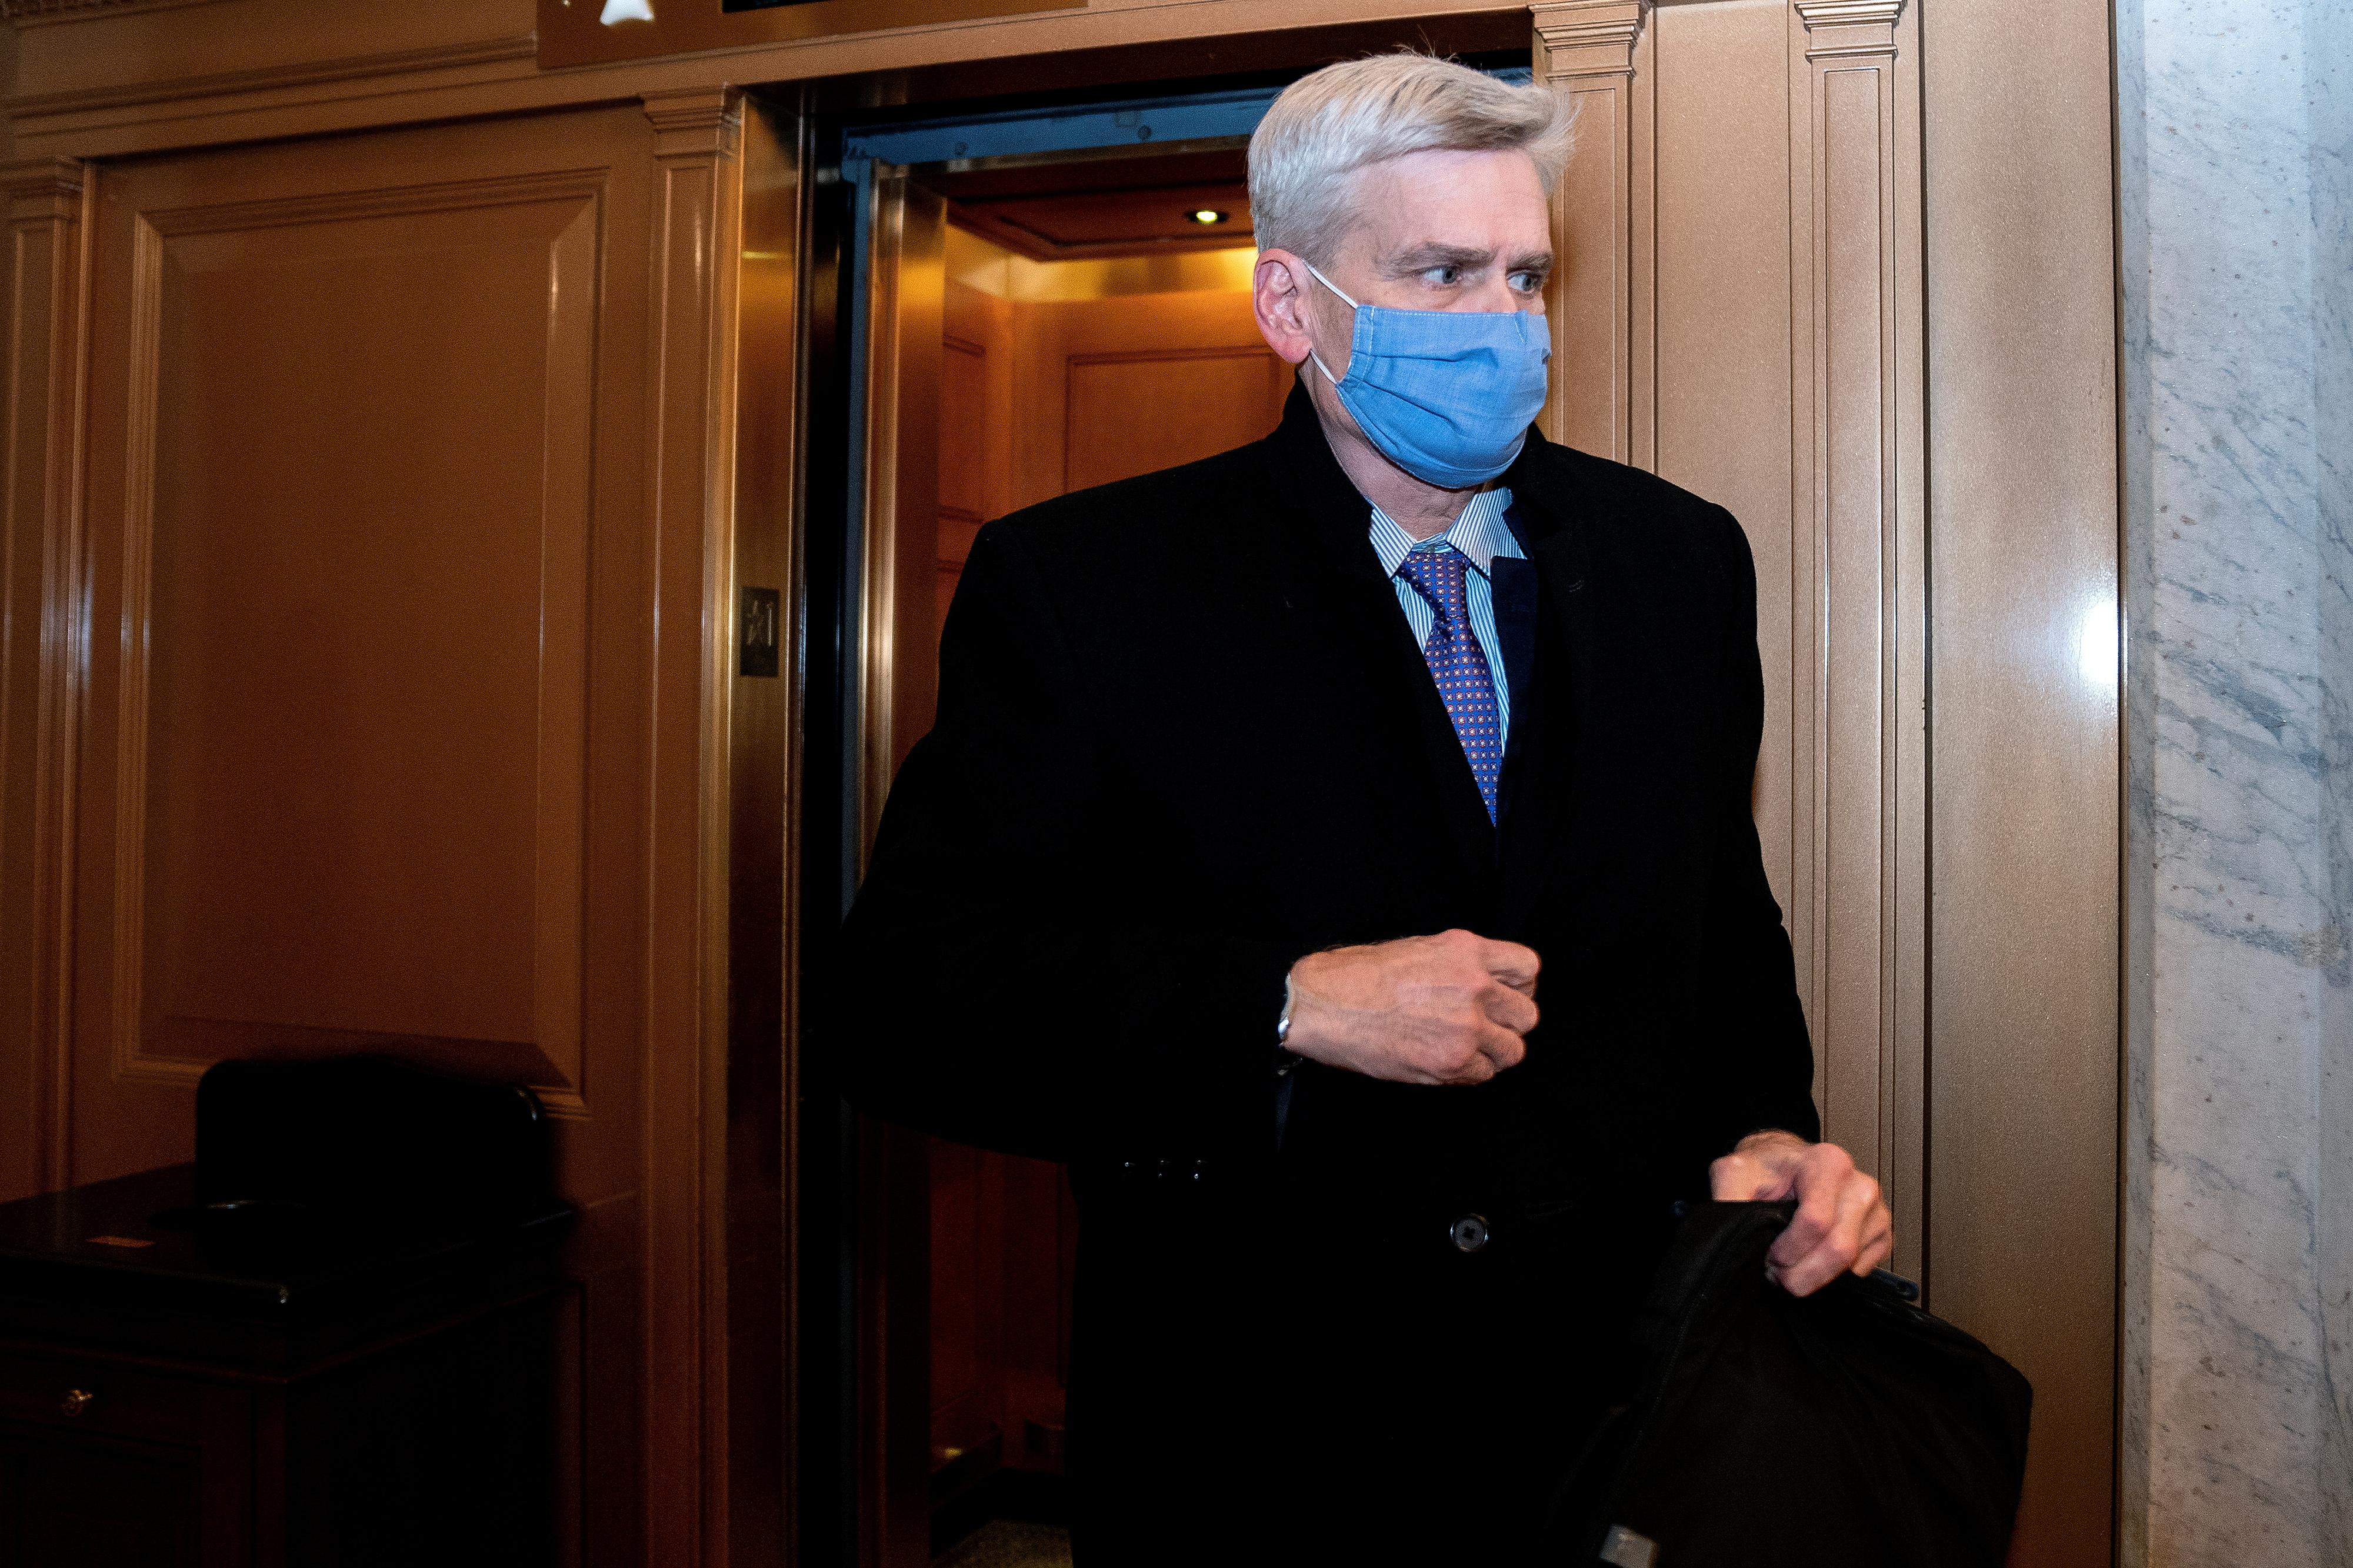 U.S. Senator Bill Cassidy (R-LA) wears a protective mask while departing the U.S. Capitol in Washington, U.S., February 13, 2021. Stefani Reynolds/Pool via REUTERS